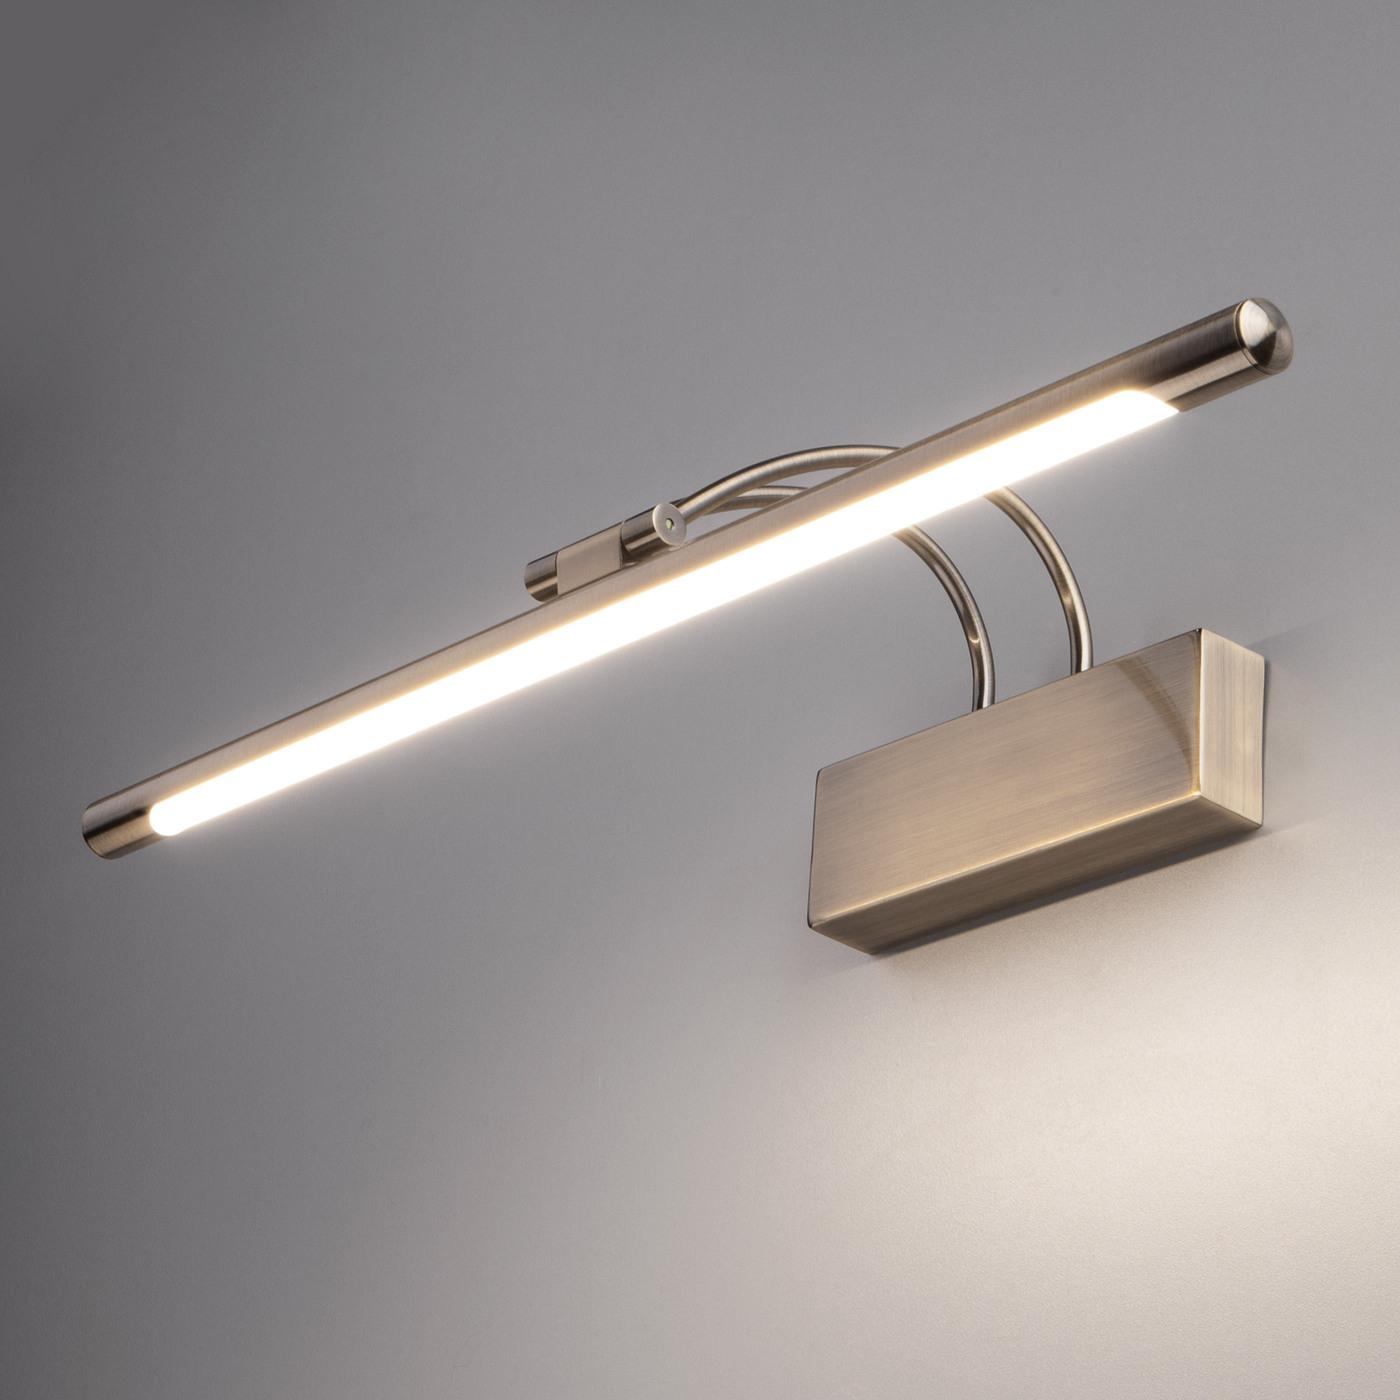 Настенный светильник Elektrostandard Simple LED светодиодный MRL LED 10W 1011 IP20, 10 Вт elektrostandard настенный светильник elektrostandard inside led белый матовый mrl led 12w